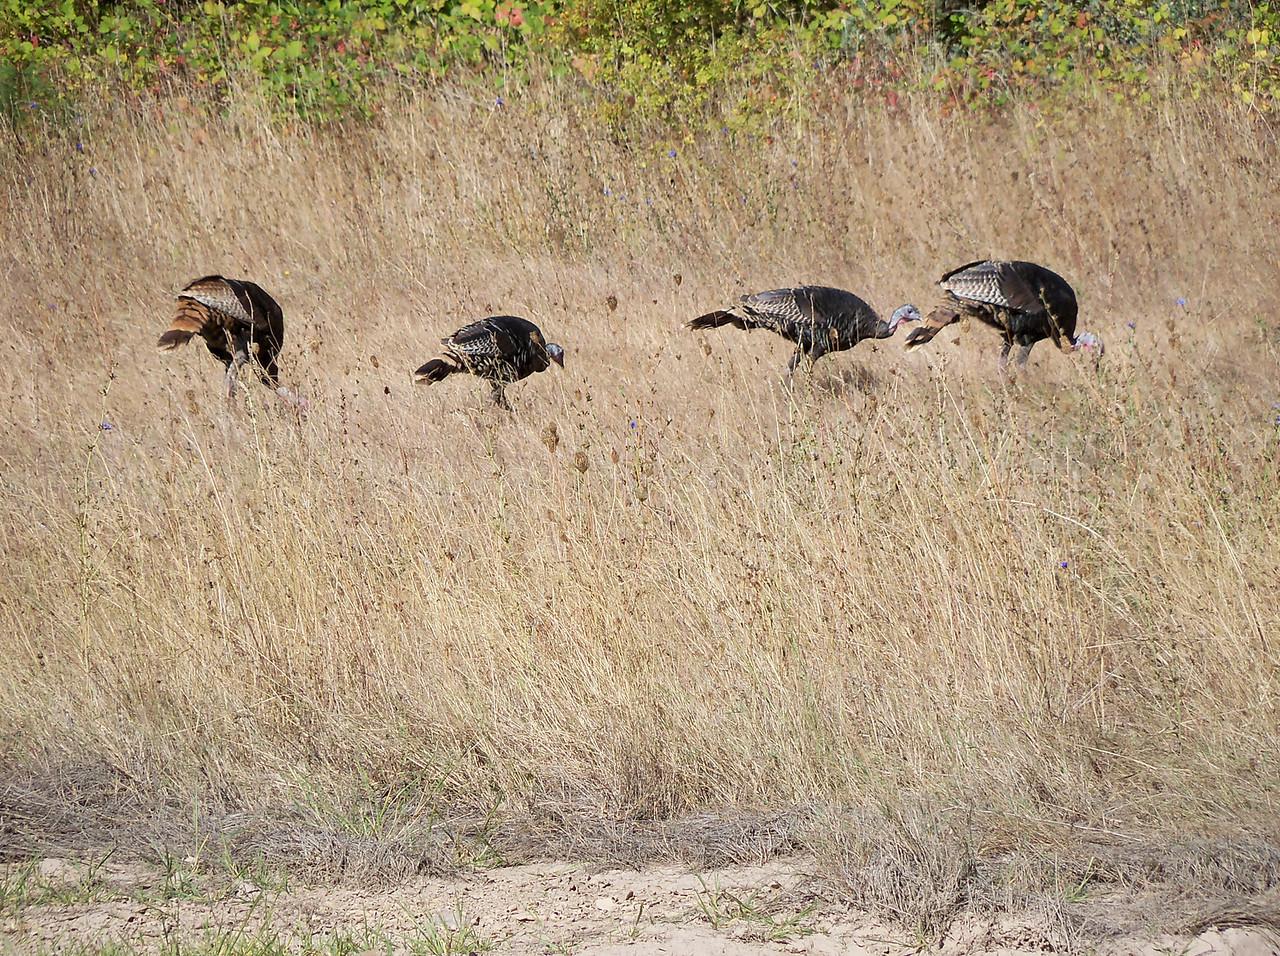 We saw lots of Wild Turkeys.